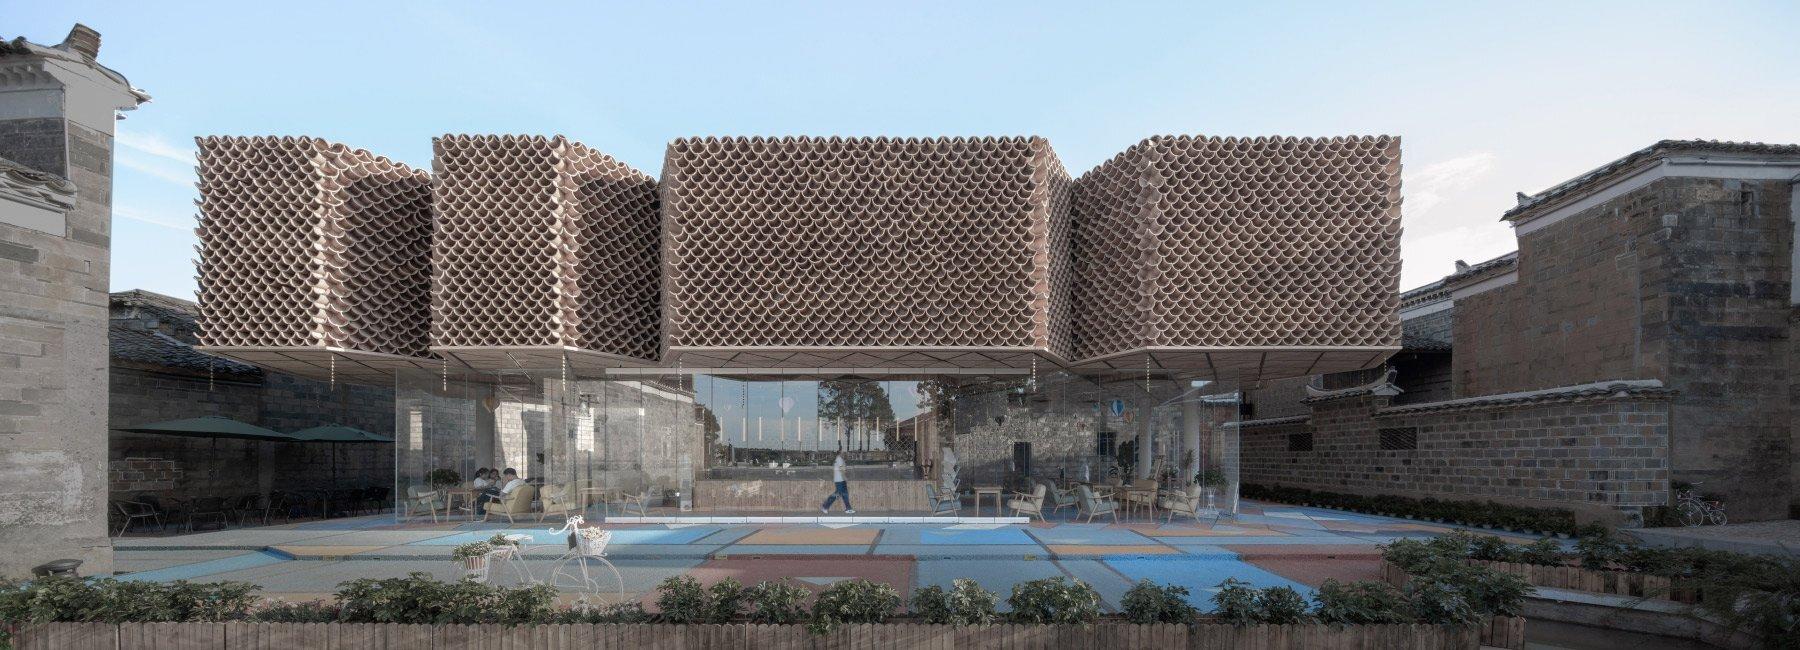 У Китаї закинуте село перетворили на арт-простір